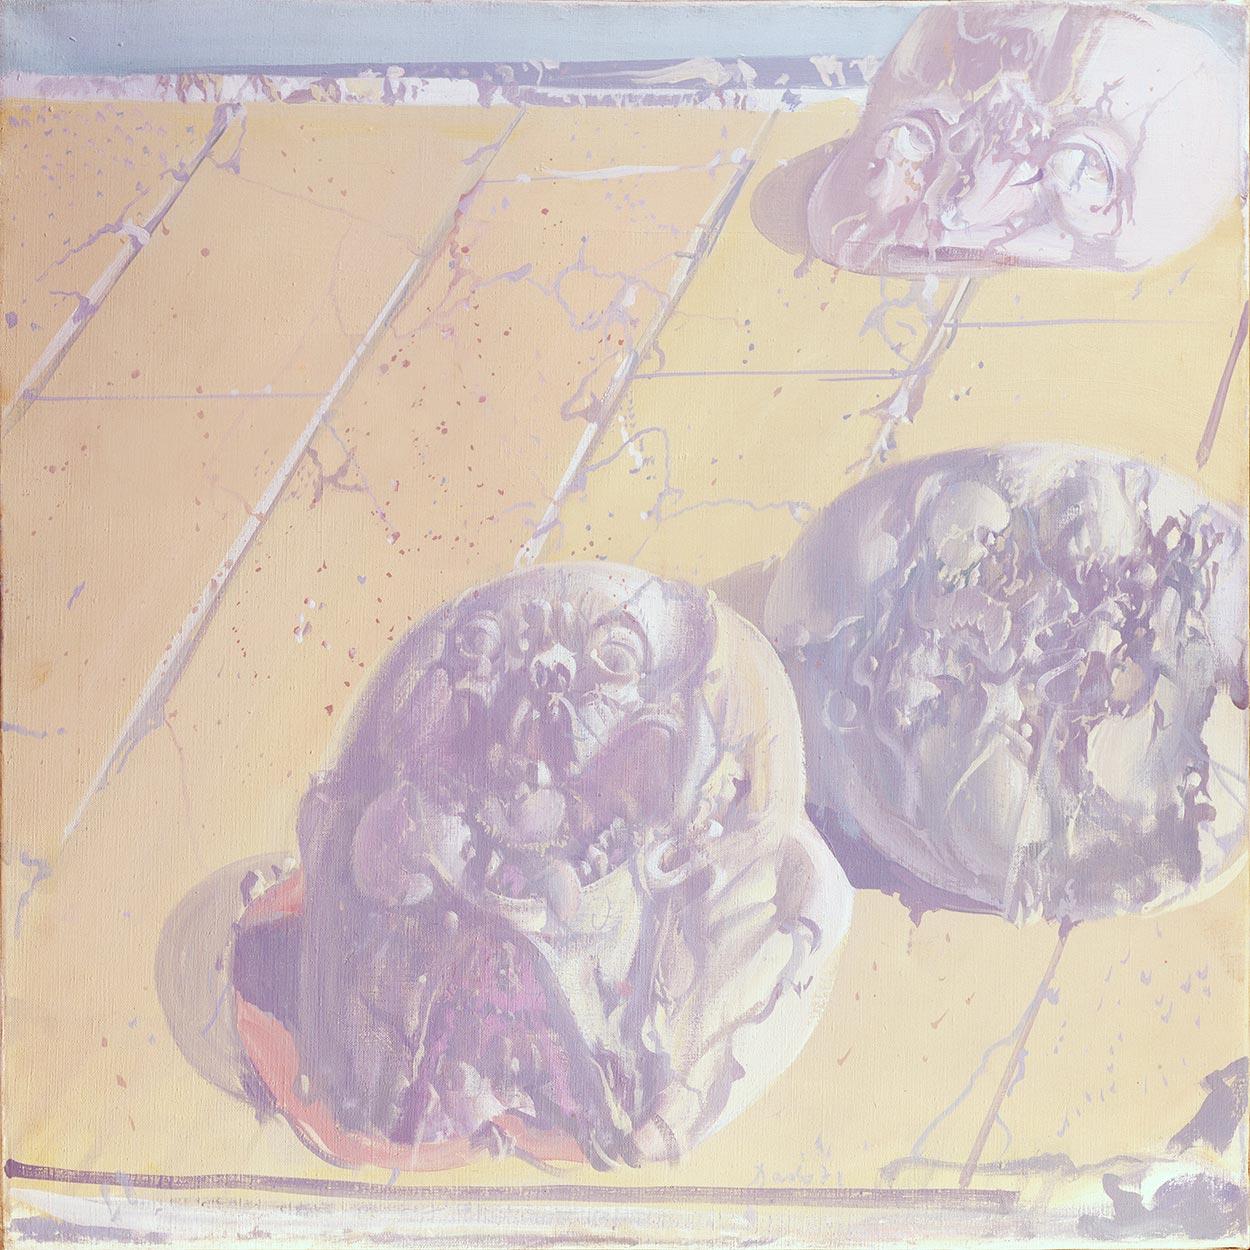 Dado's painting: The Gallery of Ancestors XXIII, 1971